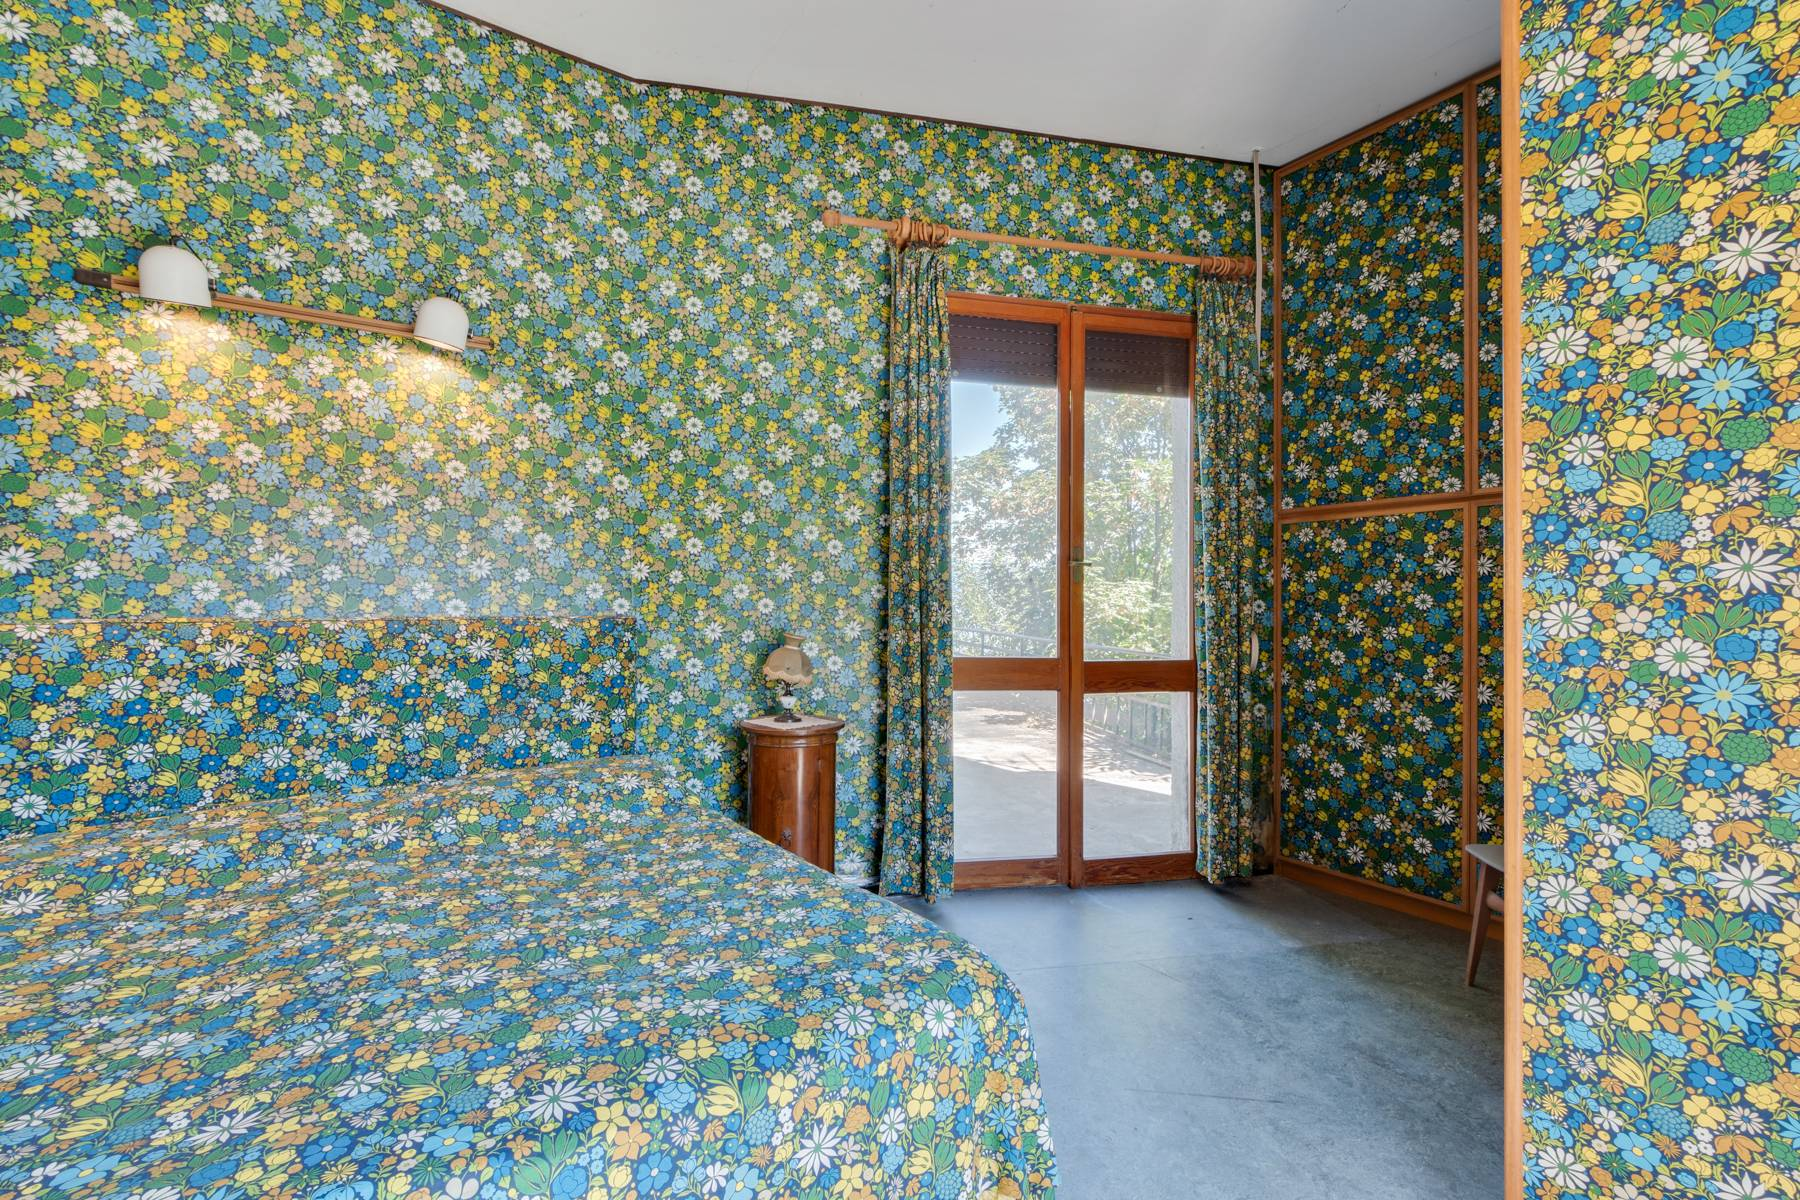 Villa in Vendita a Stresa: 5 locali, 150 mq - Foto 20